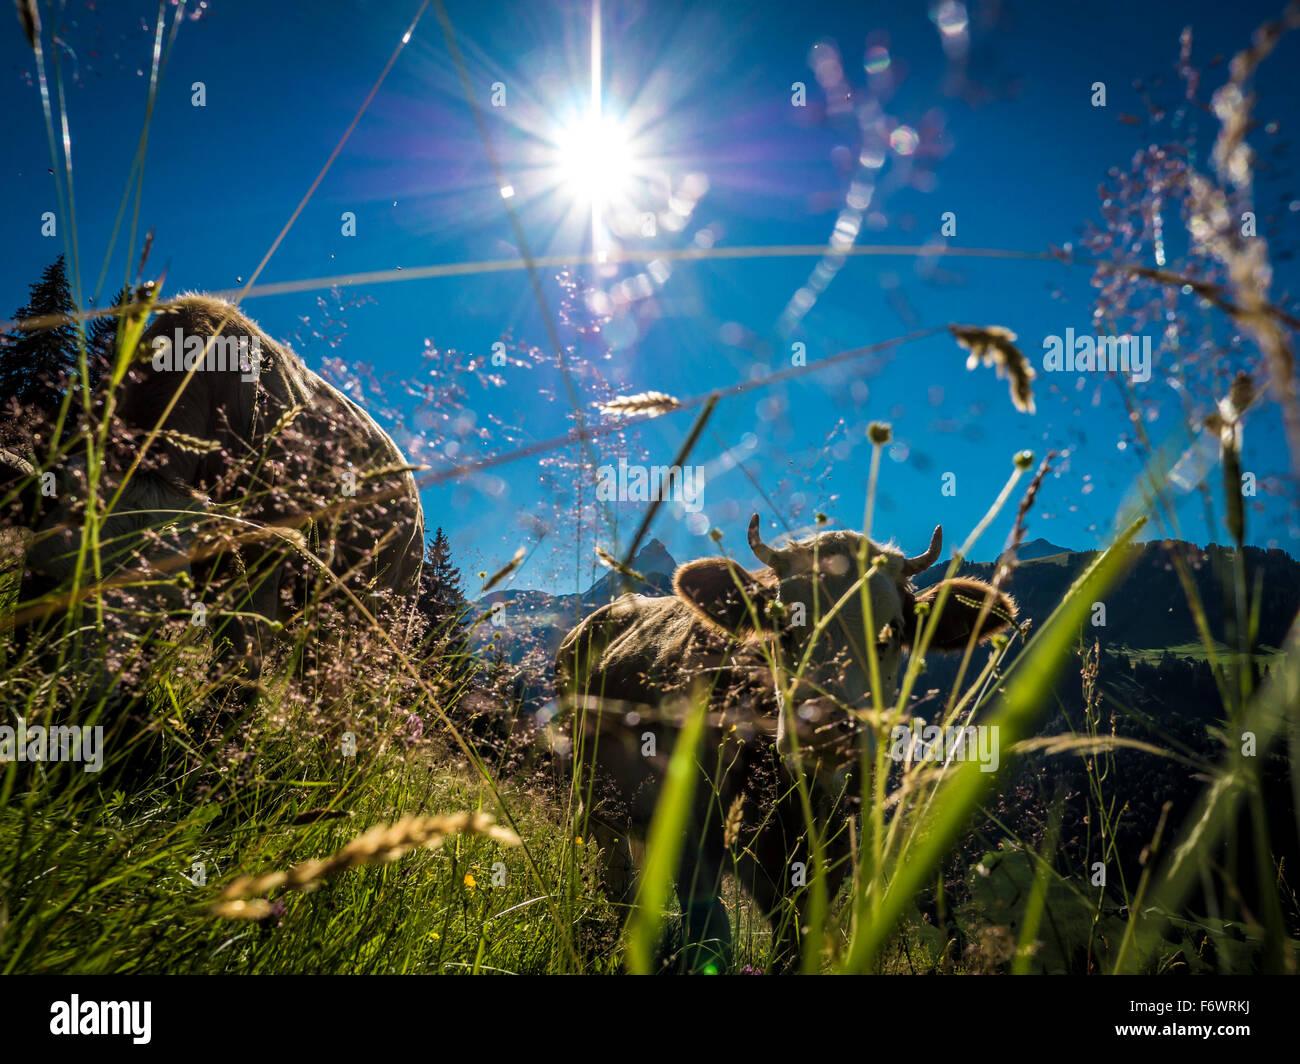 Cattle grazing, Bodme Alp, Gstaad, Canton of Bern, Switzerland - Stock Image